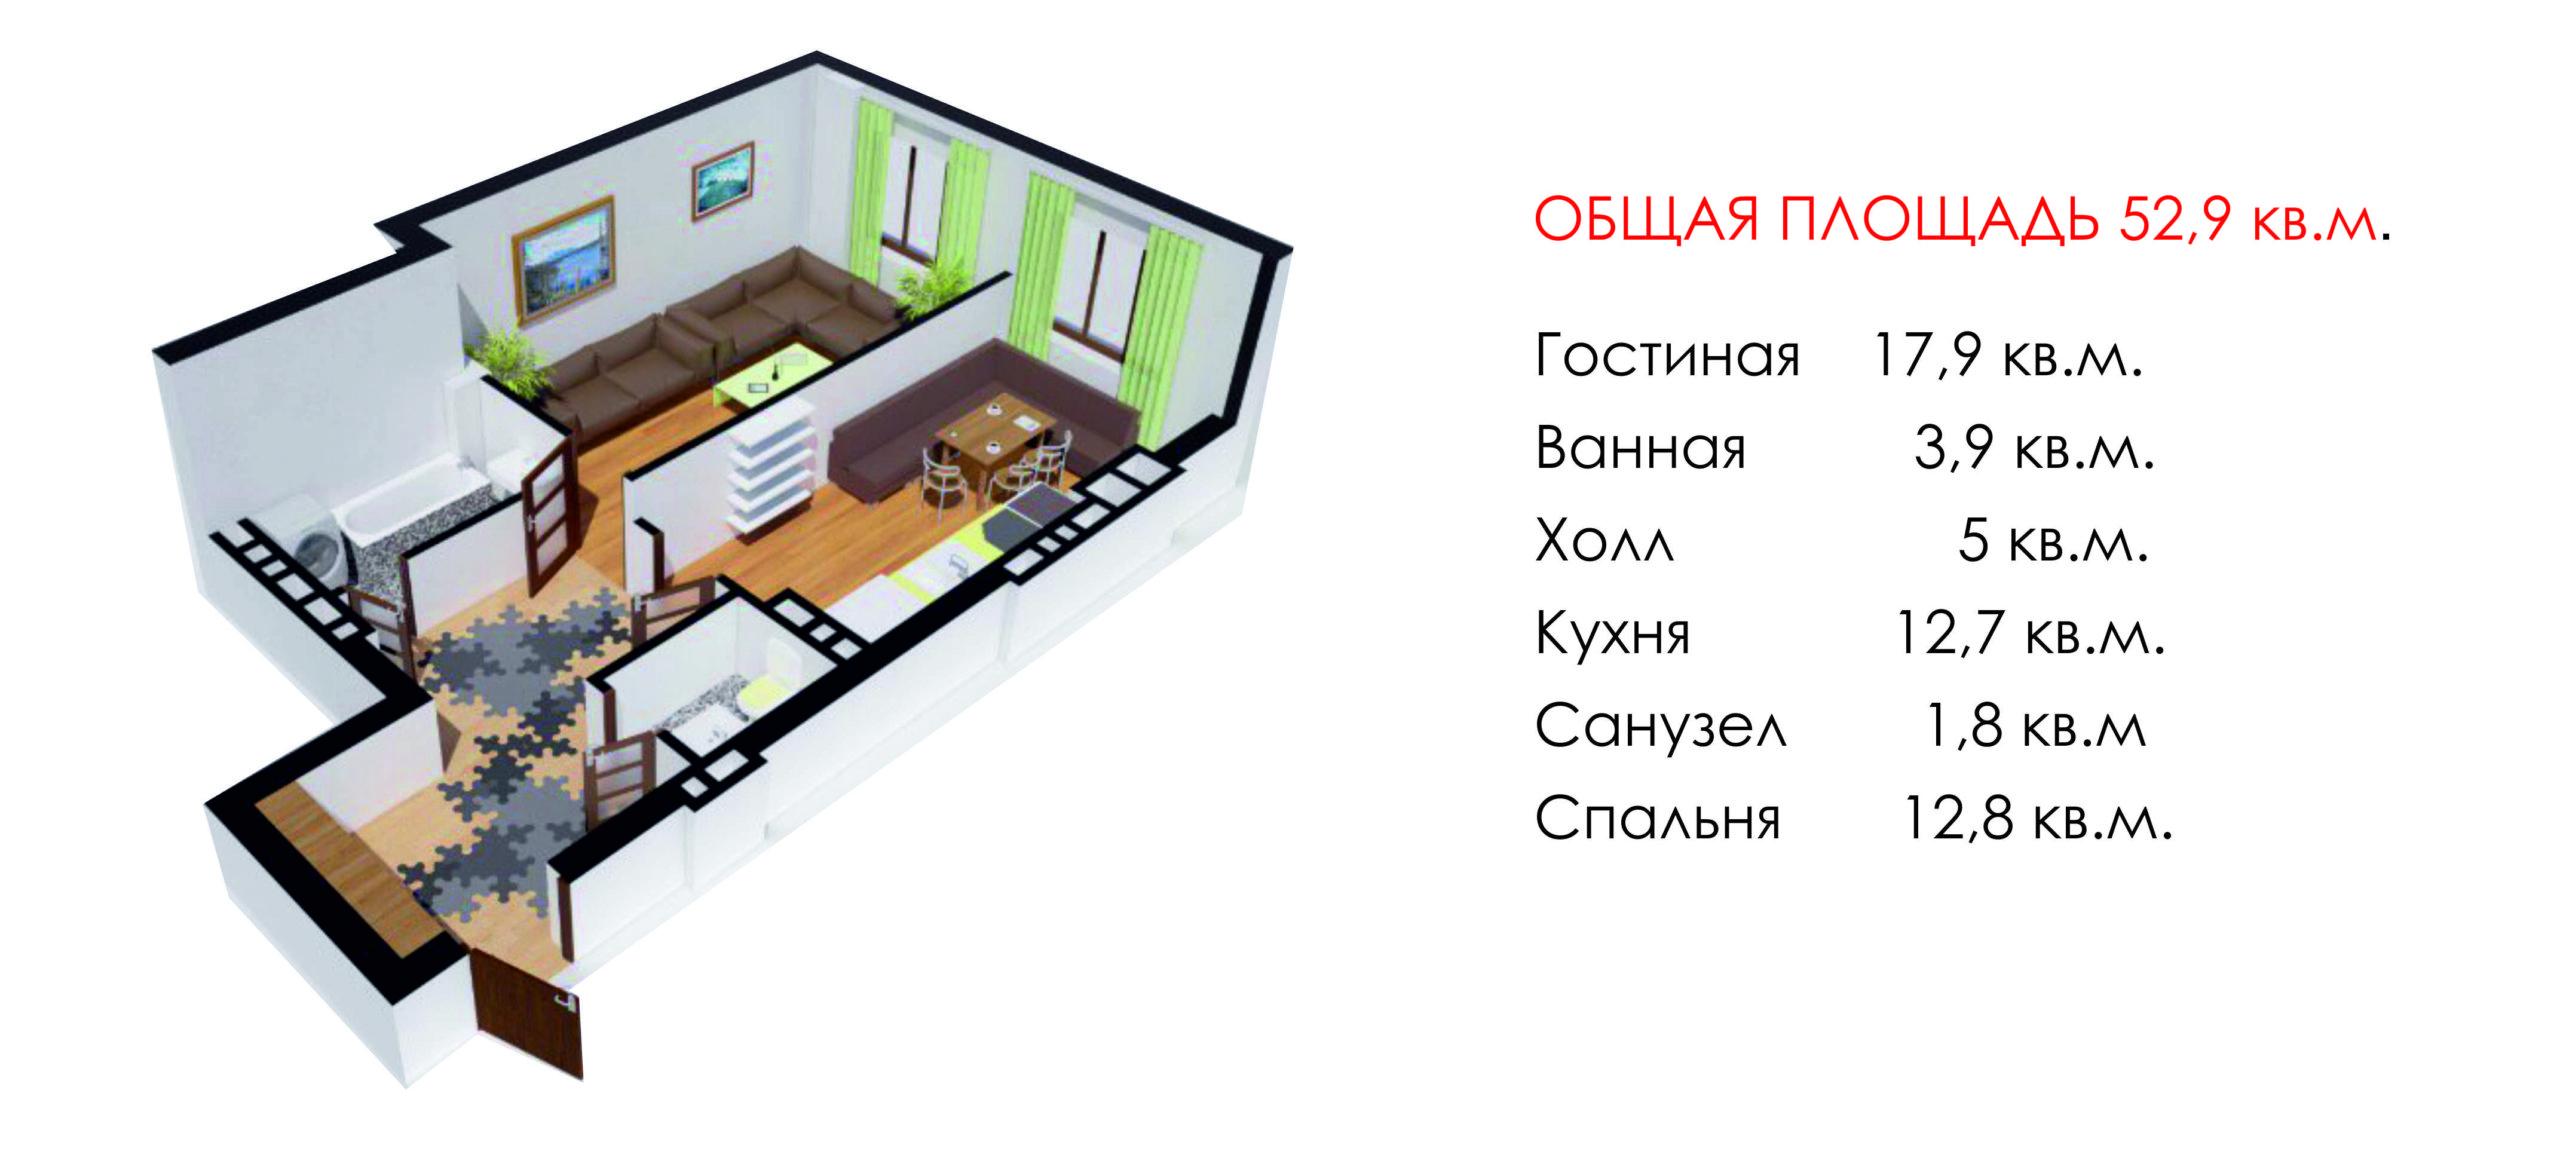 2-х комнатная квартира 52,9 кв.м.